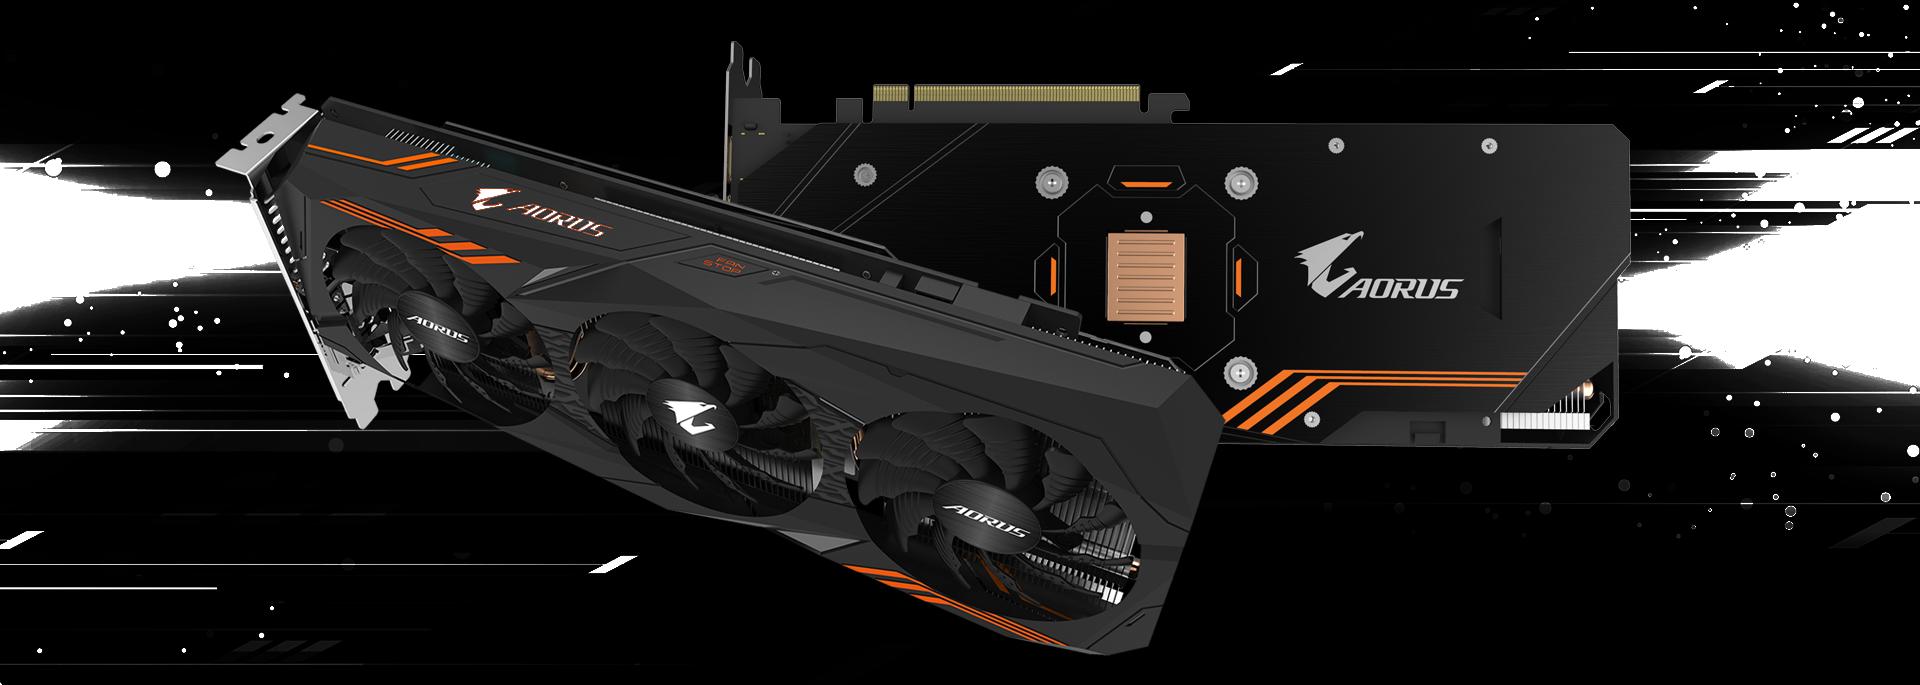 AORUS GeForce® GTX 1070Ti 8G | Graphics Card - GIGABYTE Global